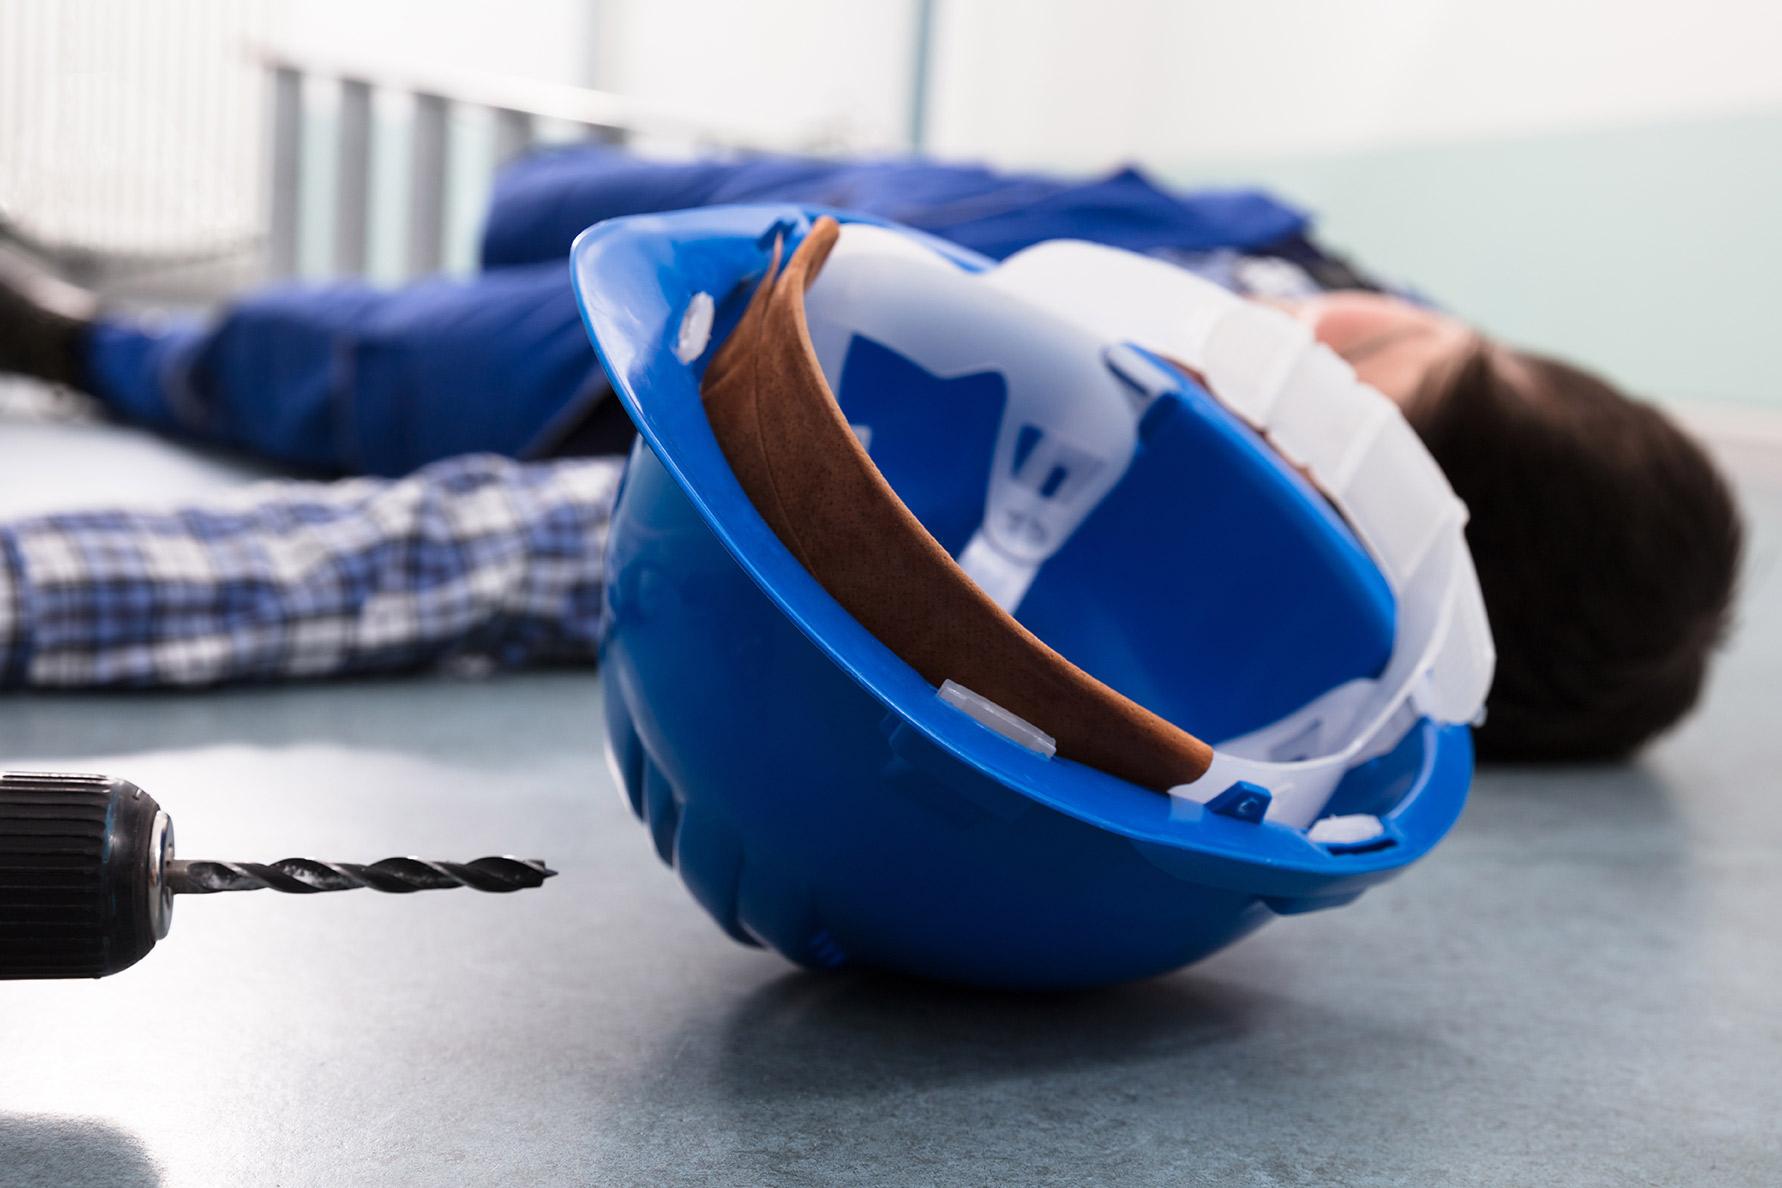 workplace fatality